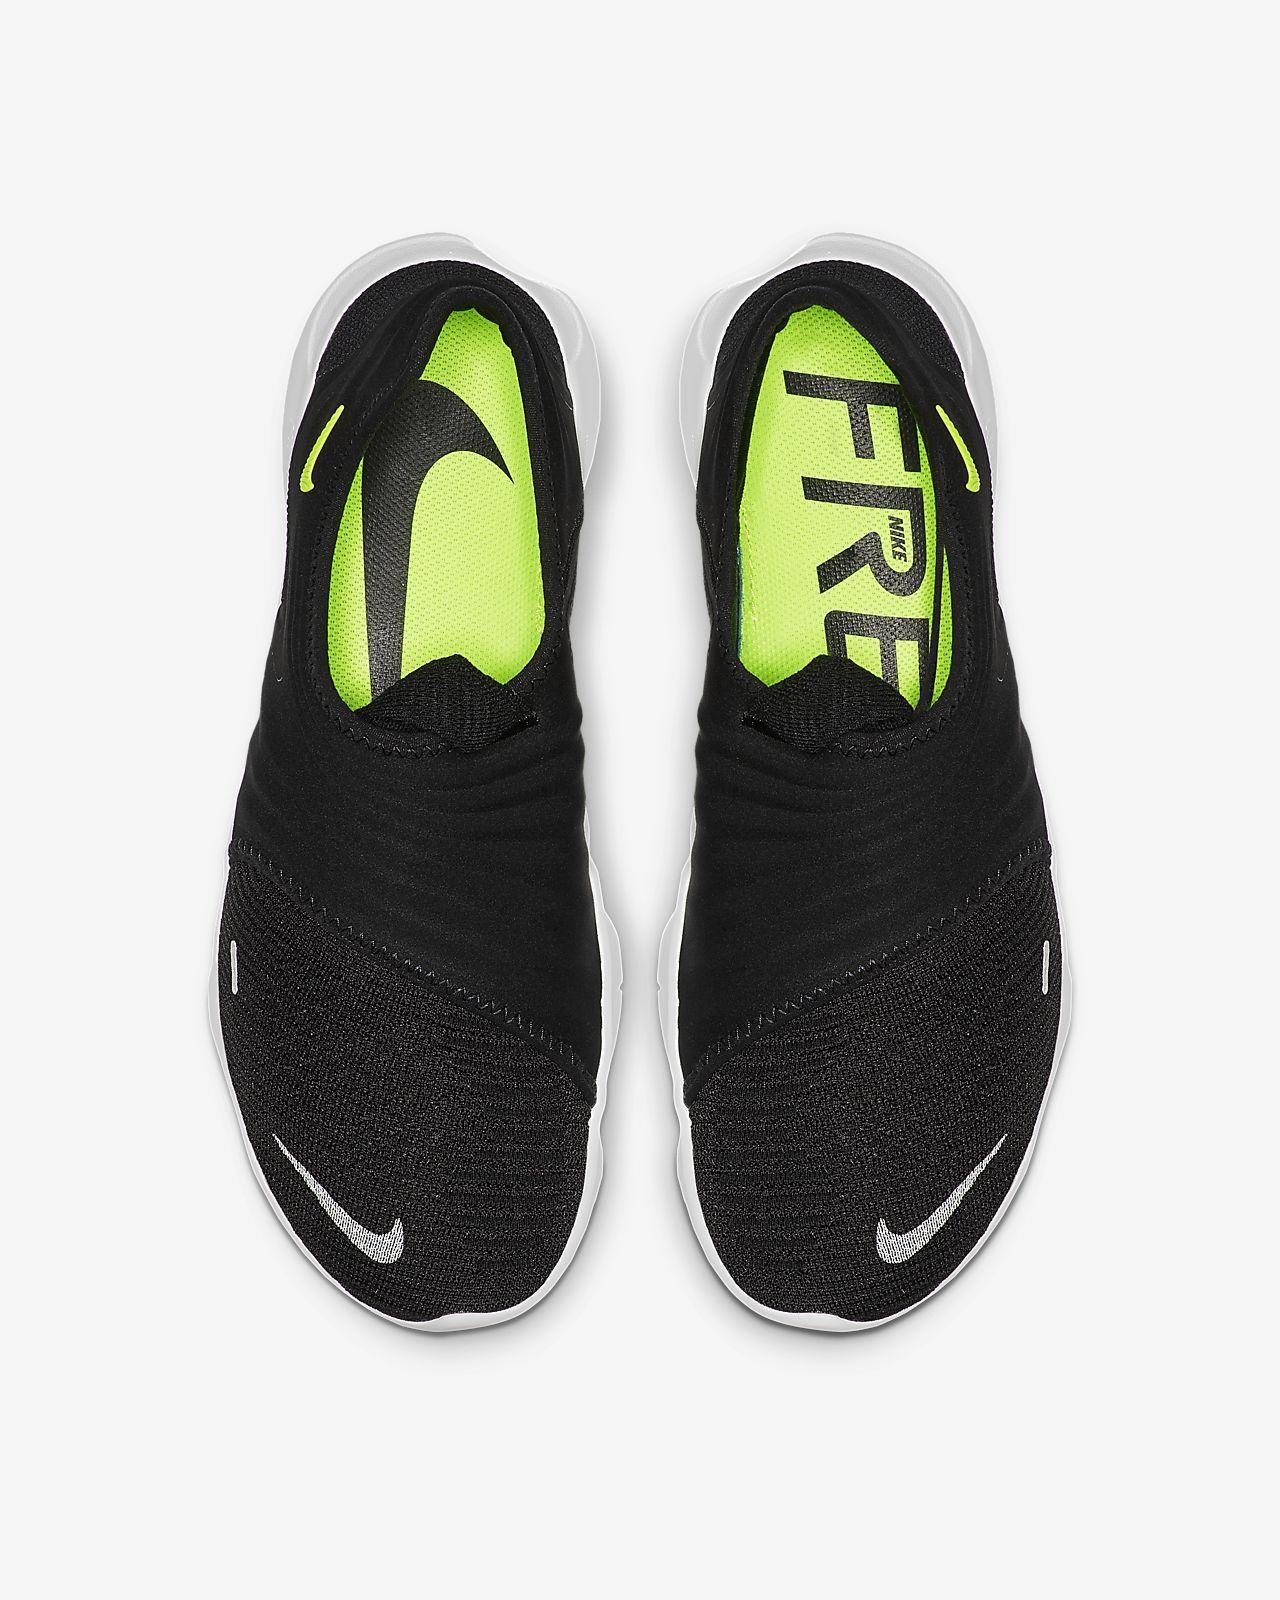 nike free billigt run 3 skor rosa, Nike Jr Mercurial X